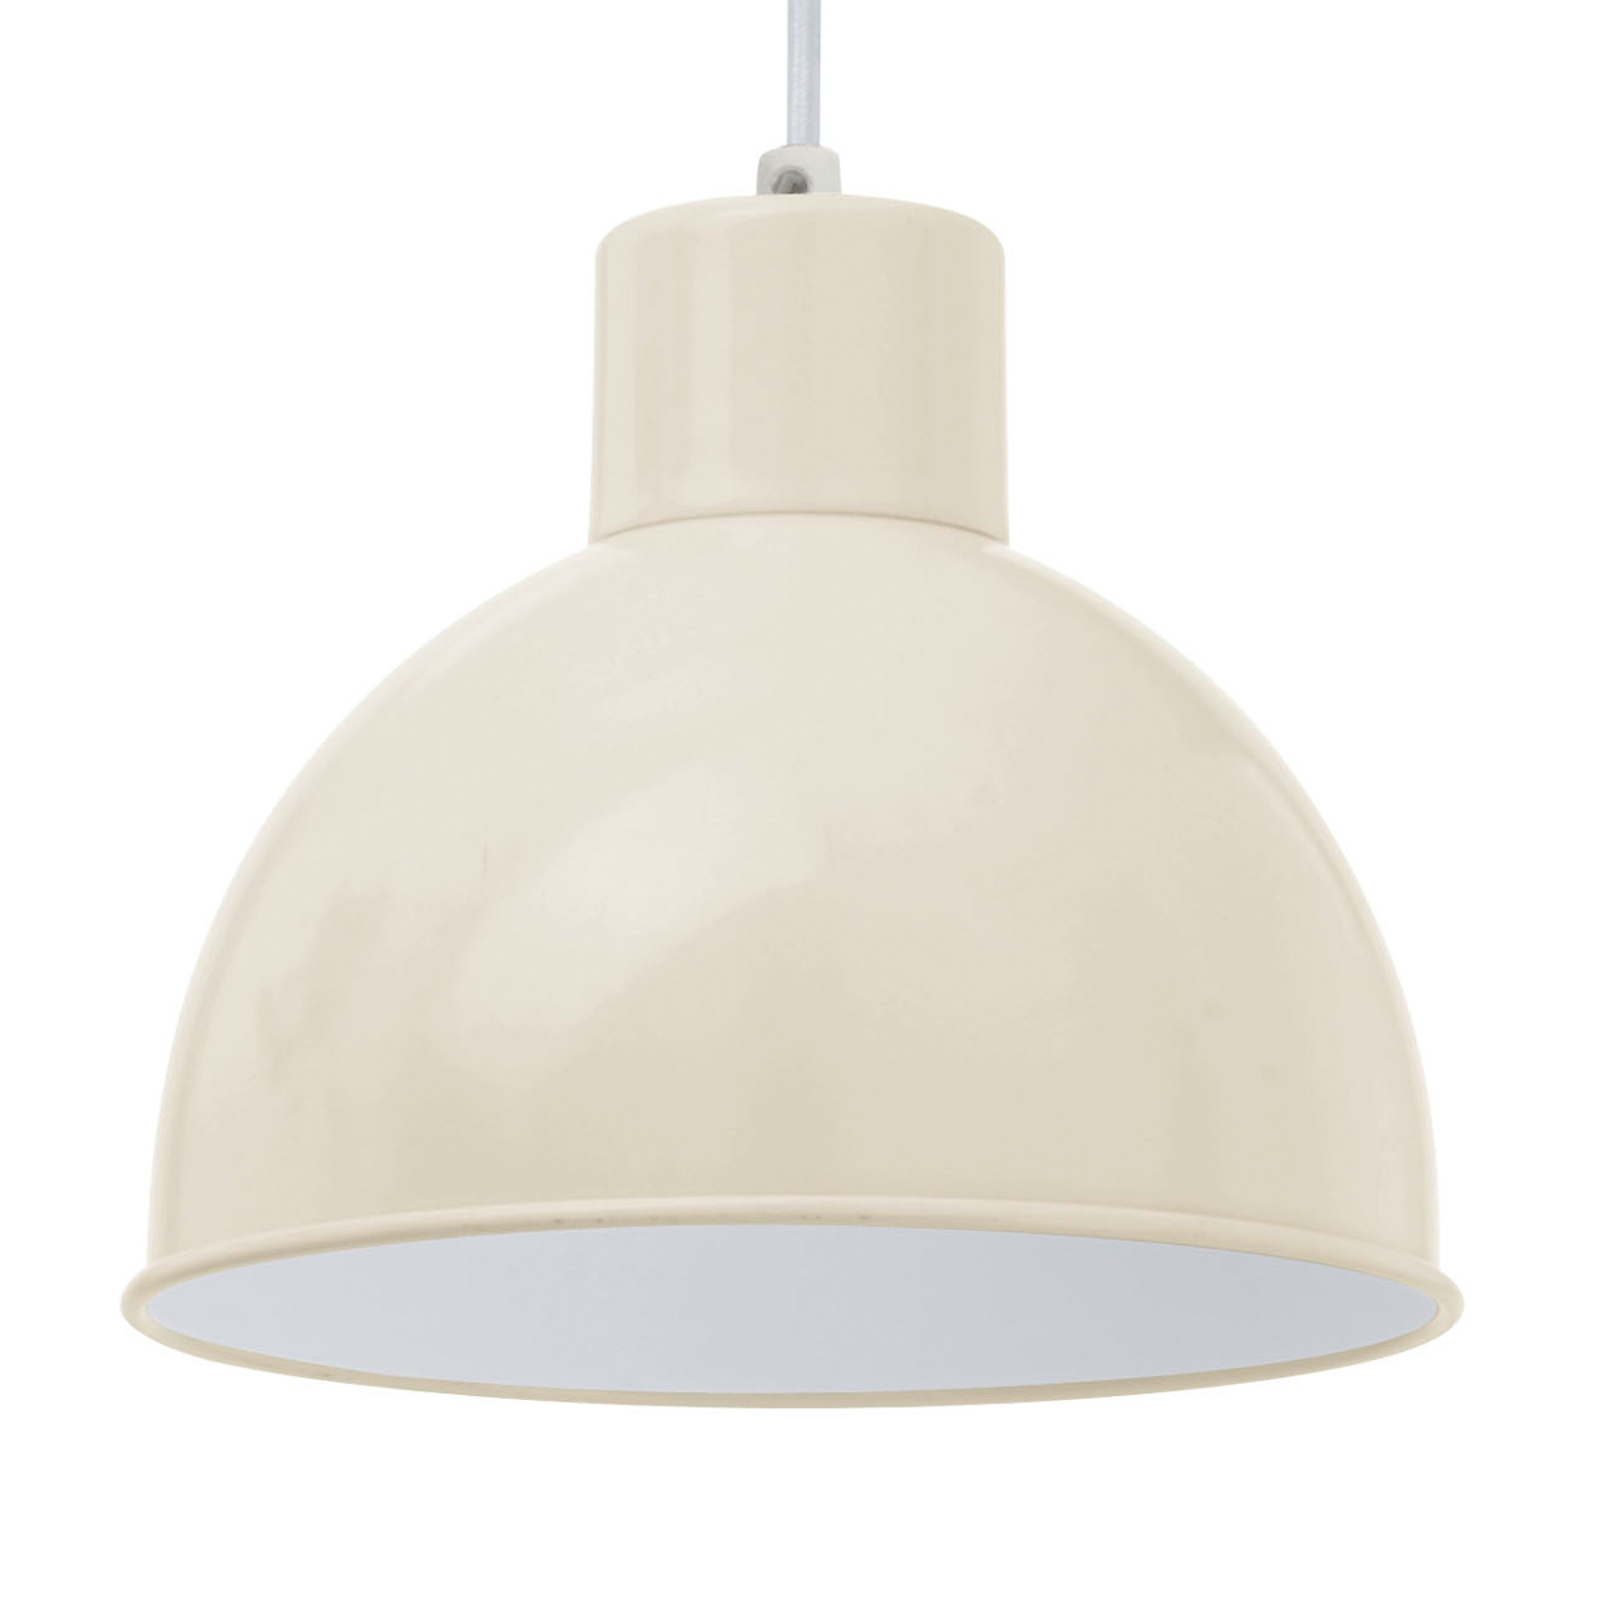 Zandkleurige hanglamp Andrin - binnenin wit